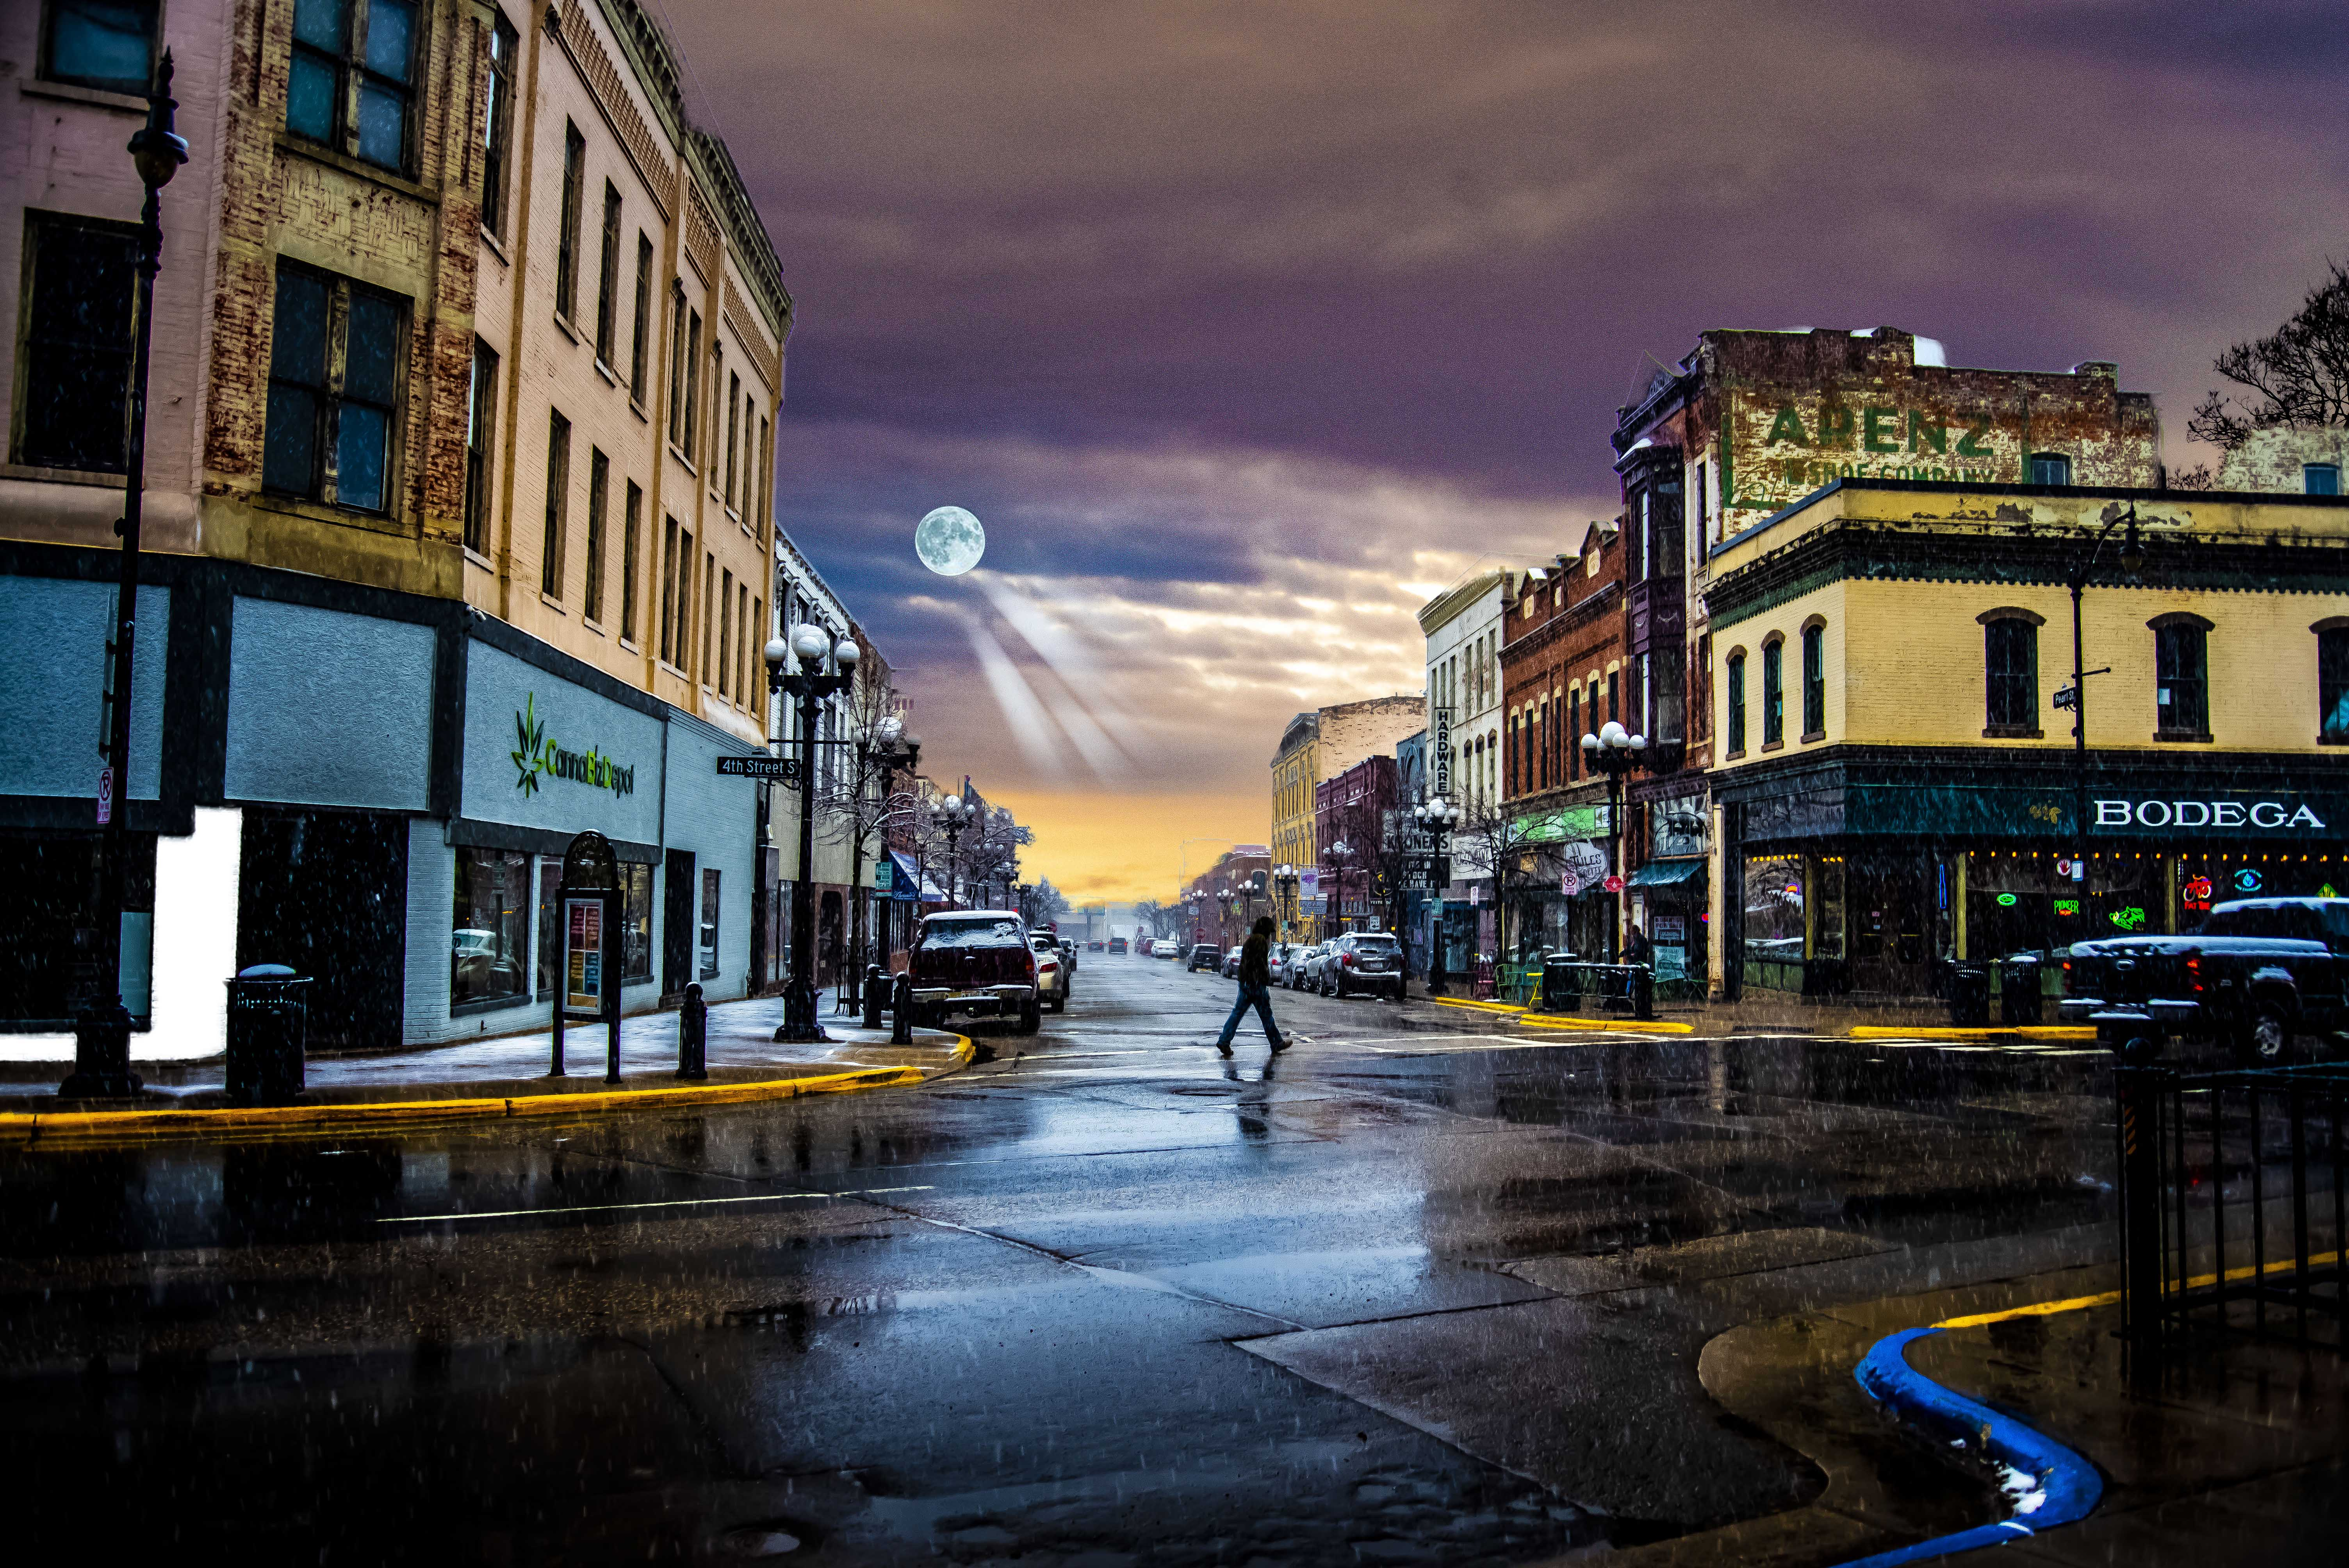 streetwalkermoon